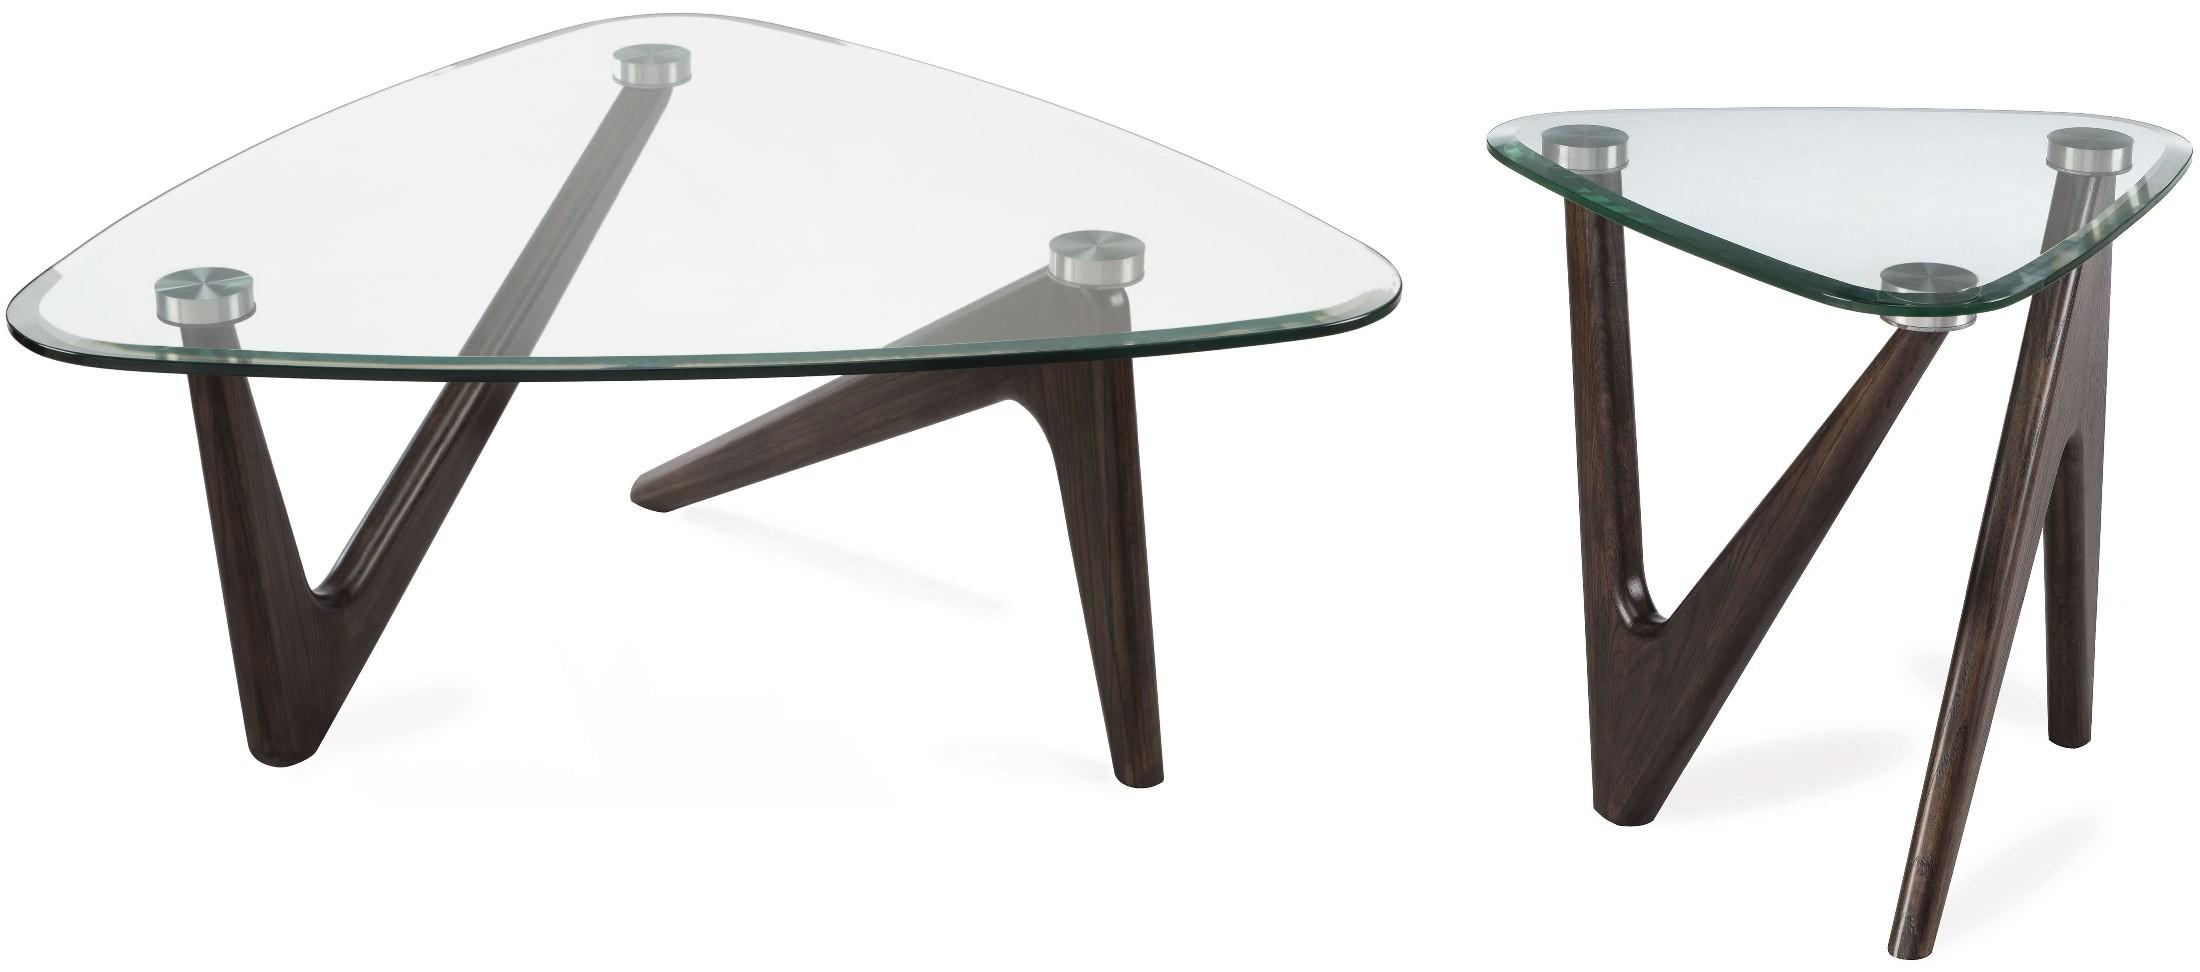 Garvin Distressed Nutmeg Cocktail Table Set From Magnussen Home Coleman Furniture